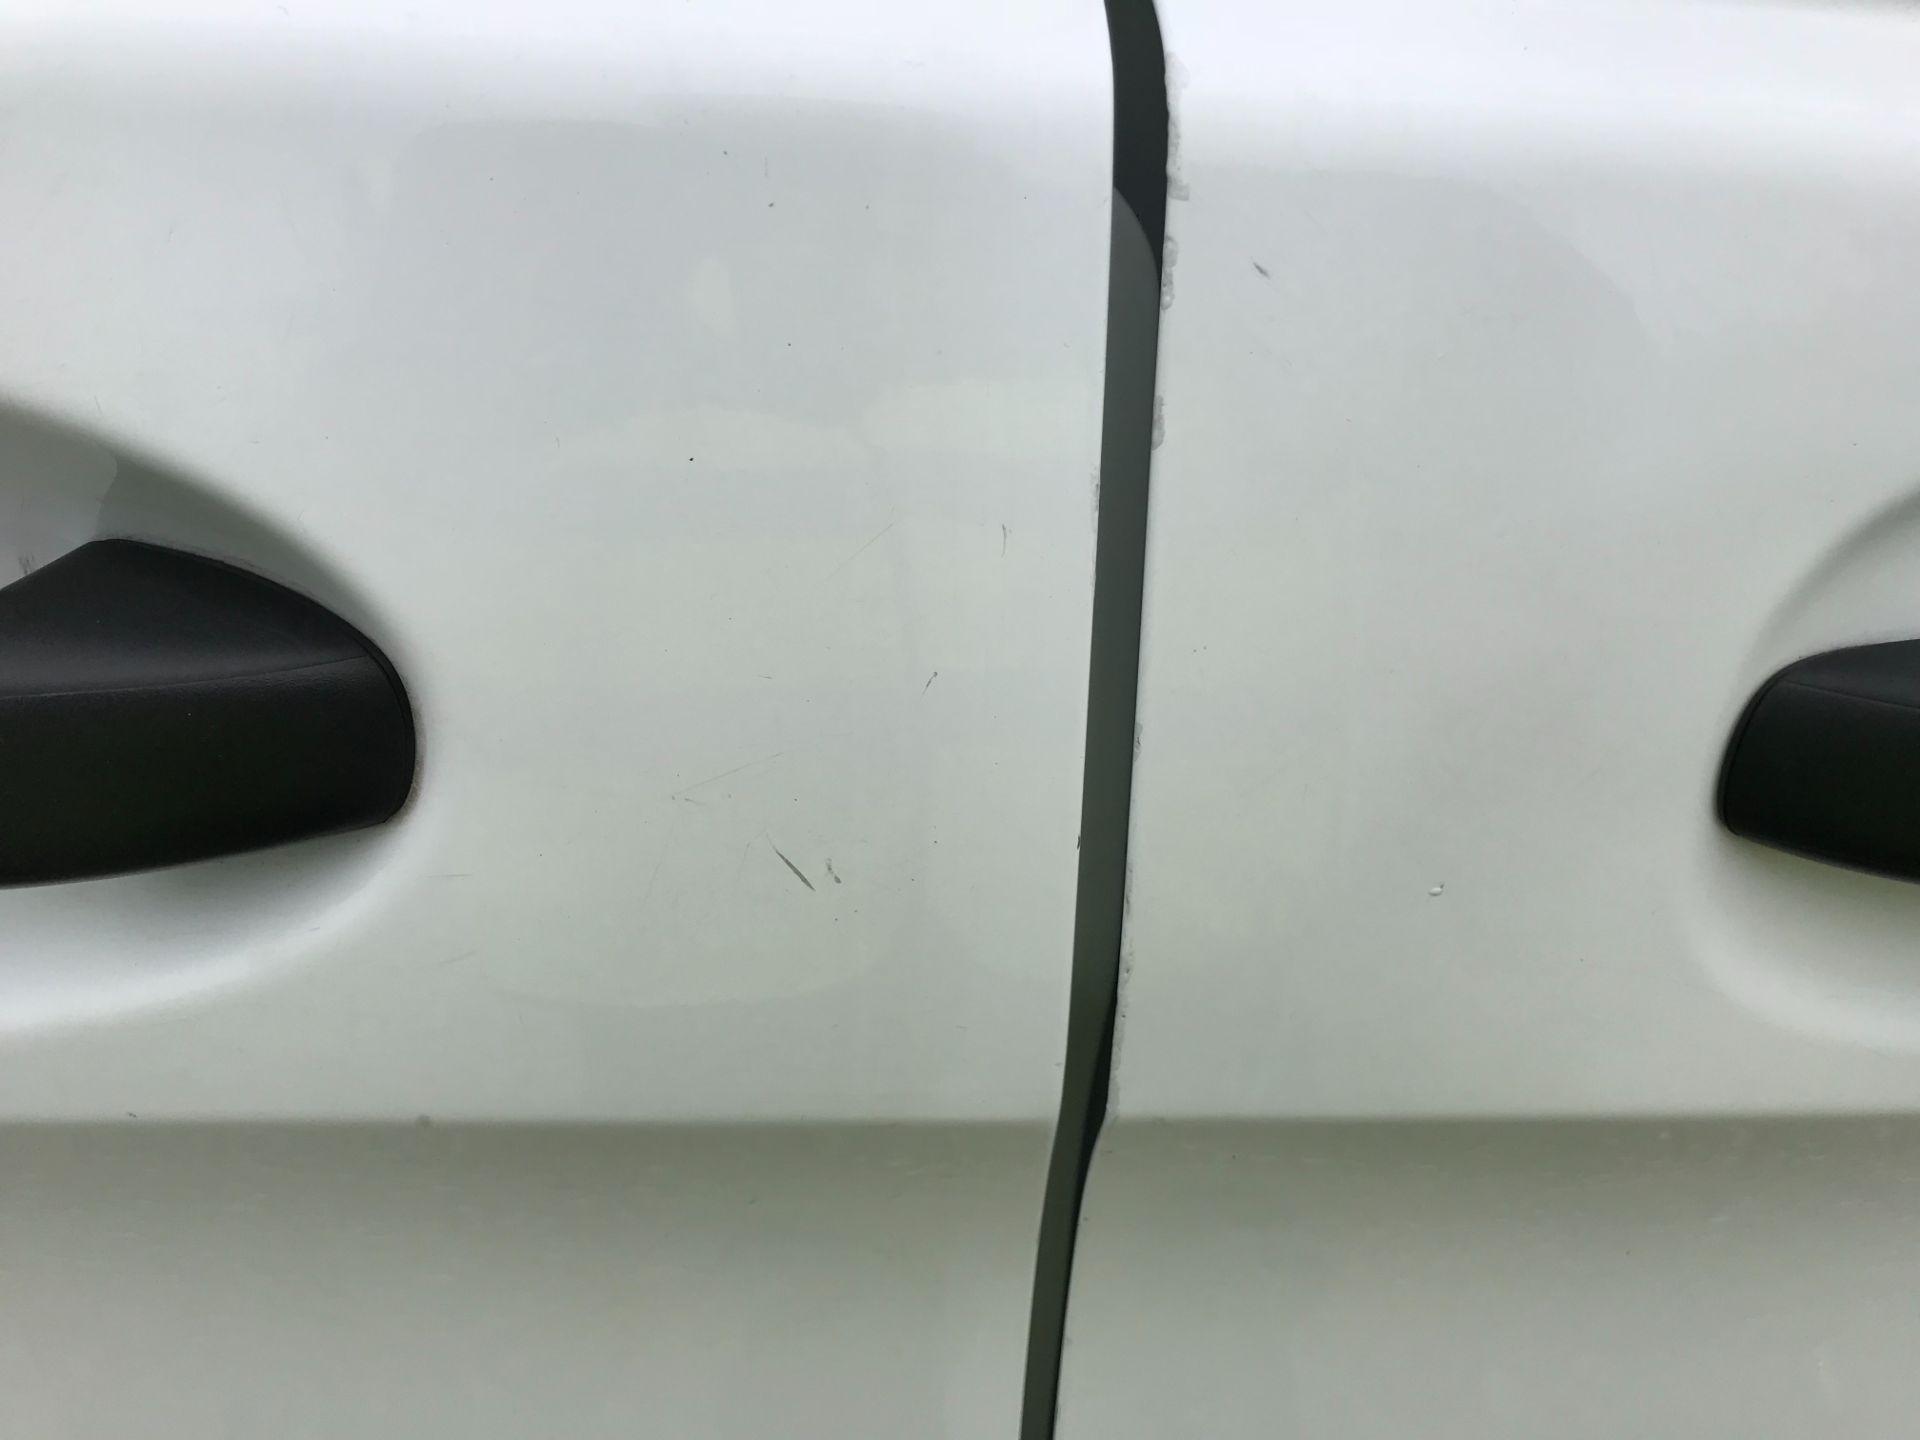 2017 Mercedes-Benz Vito LONG 111CDI VAN EURO 6  (KM67BCV) Image 44